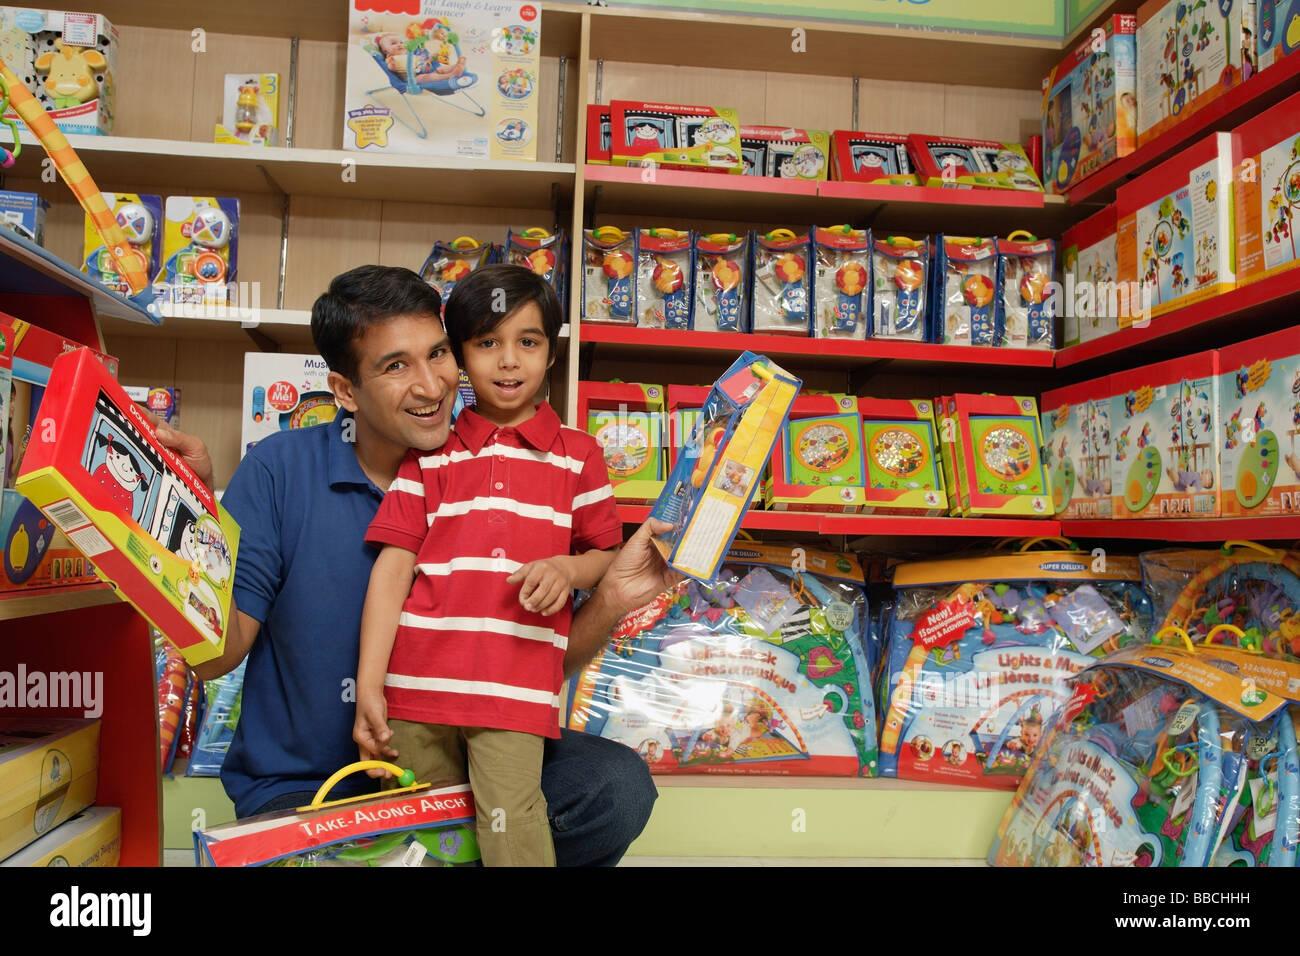 Boy Toys For Dads : Toys for boys shop stock photos